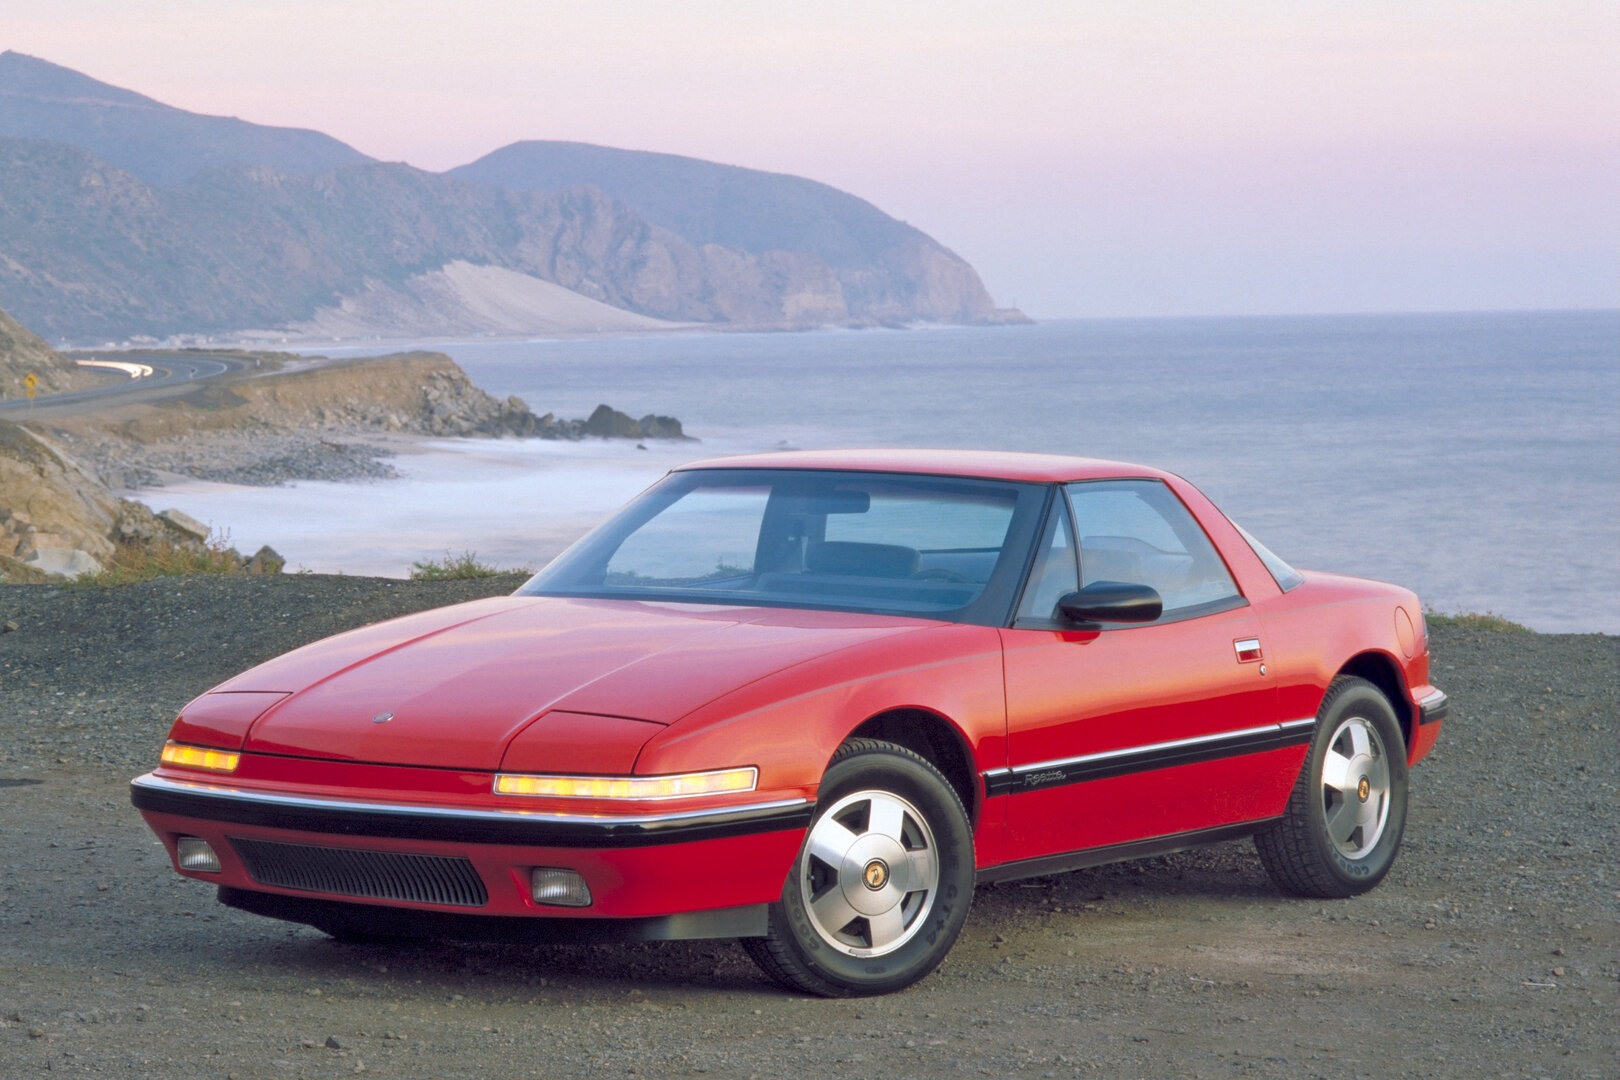 1988 Buick Reatta 6